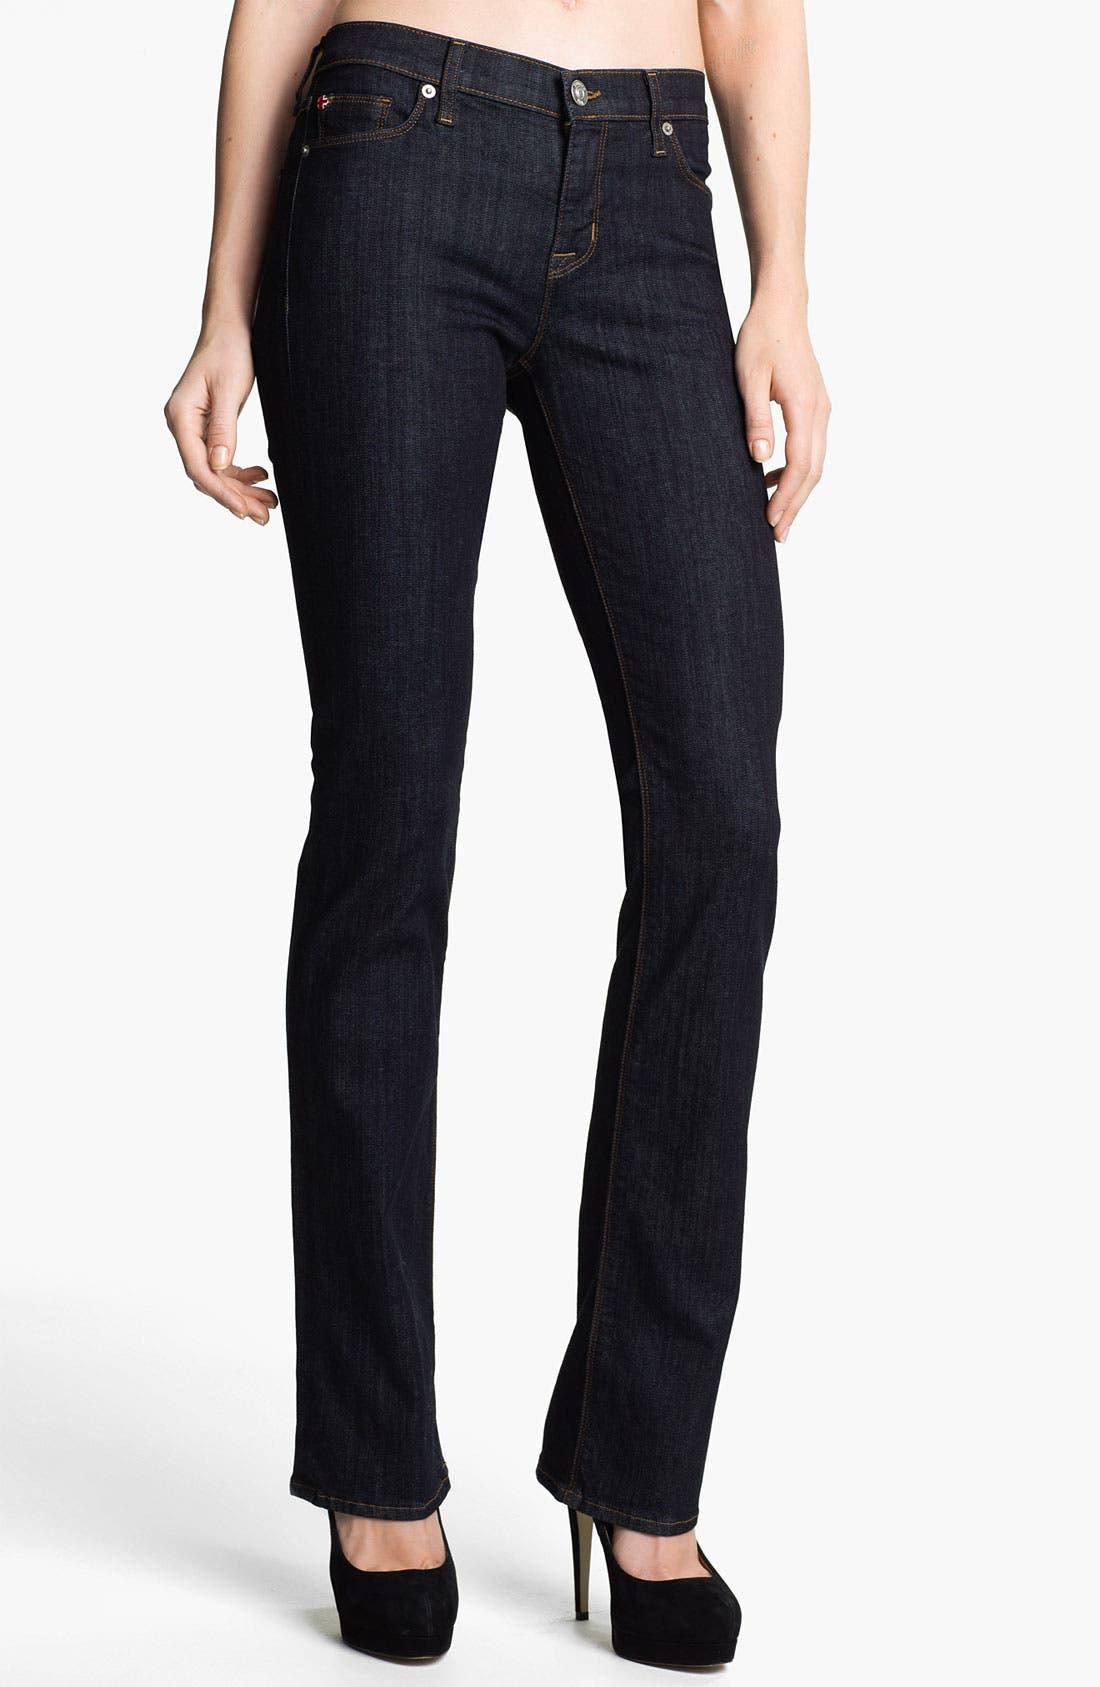 Main Image - Hudson Jeans 'Elle' Baby Bootcut Jeans (Foley)